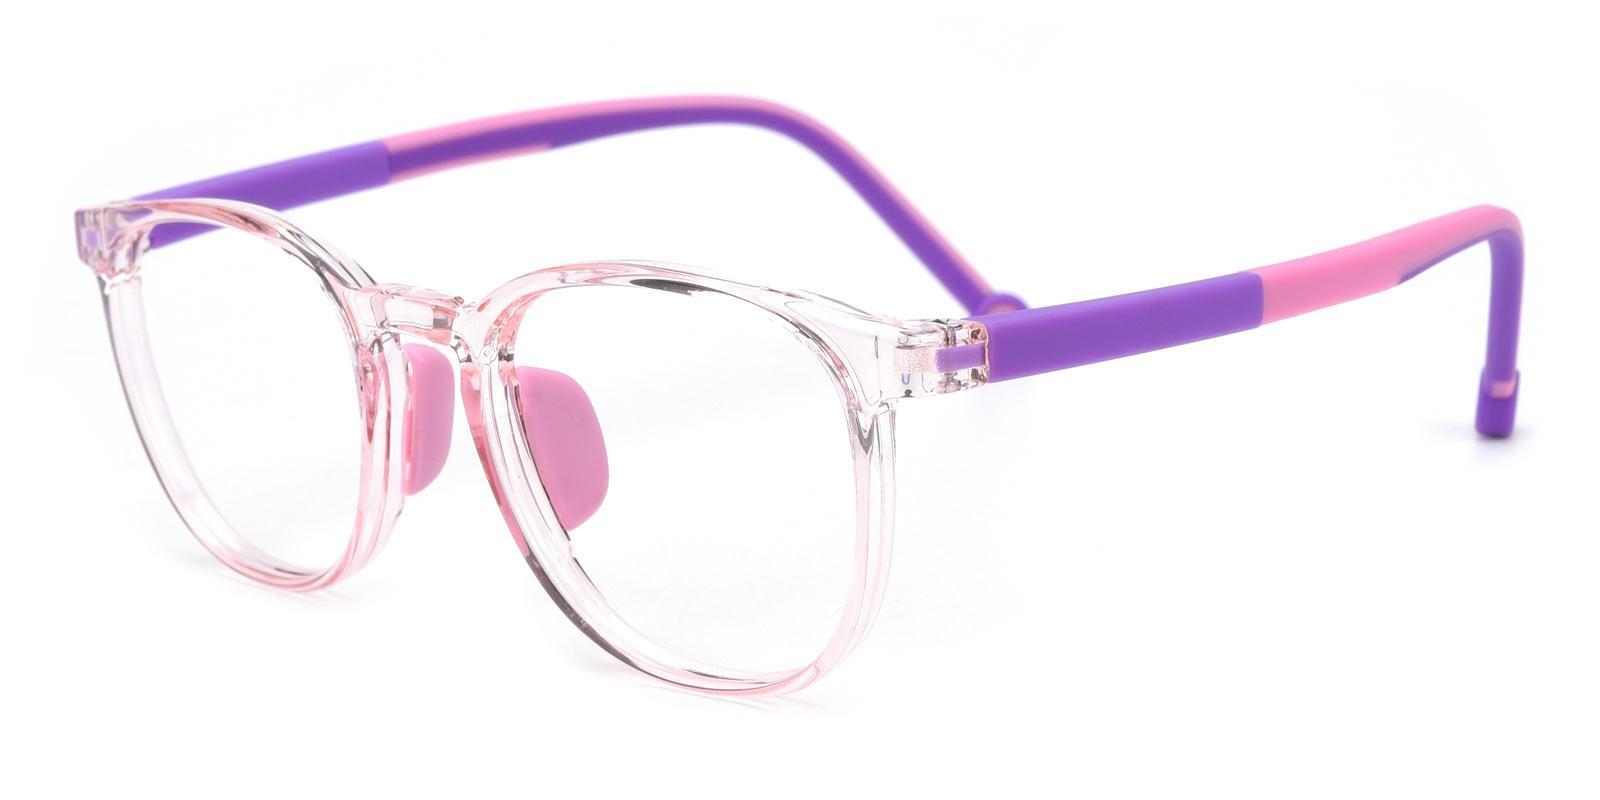 Jennifer-Purple-Round-Plastic-Eyeglasses-detail